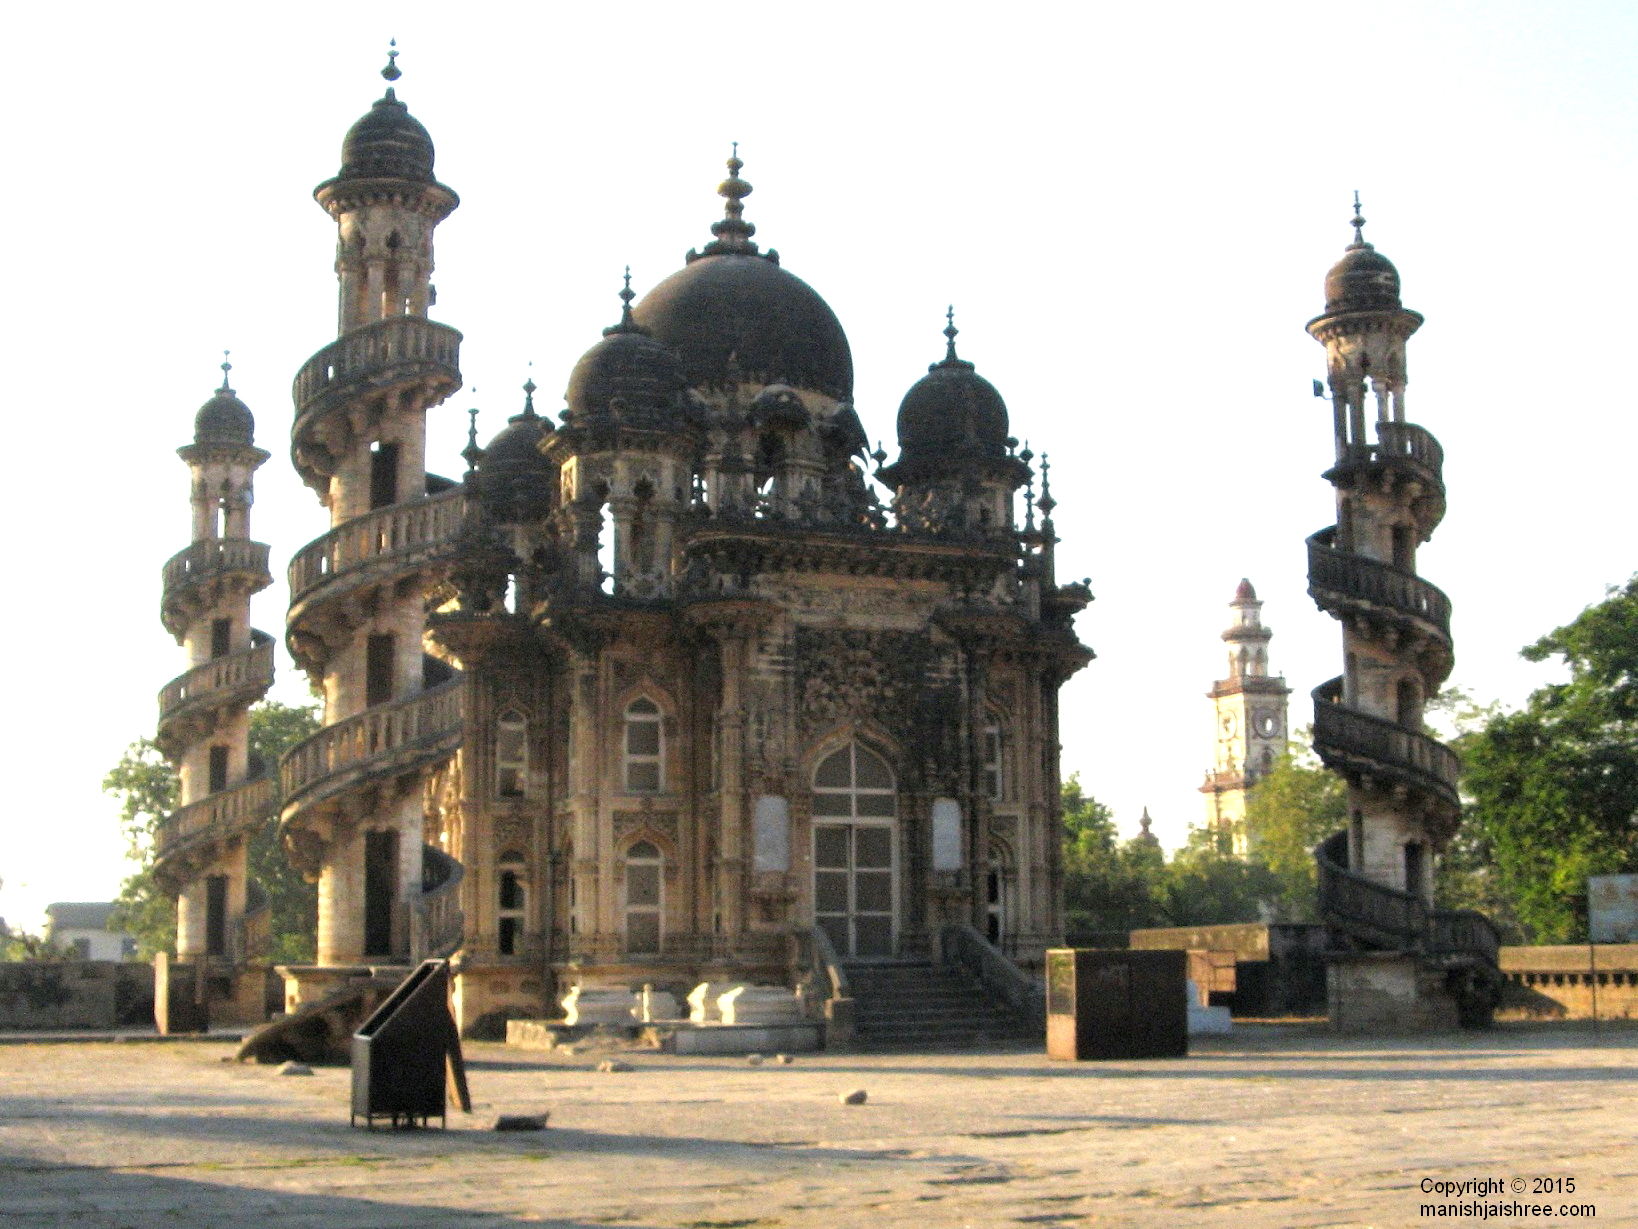 The tomb of Vazir Bahauddin Bhar, Junagarh